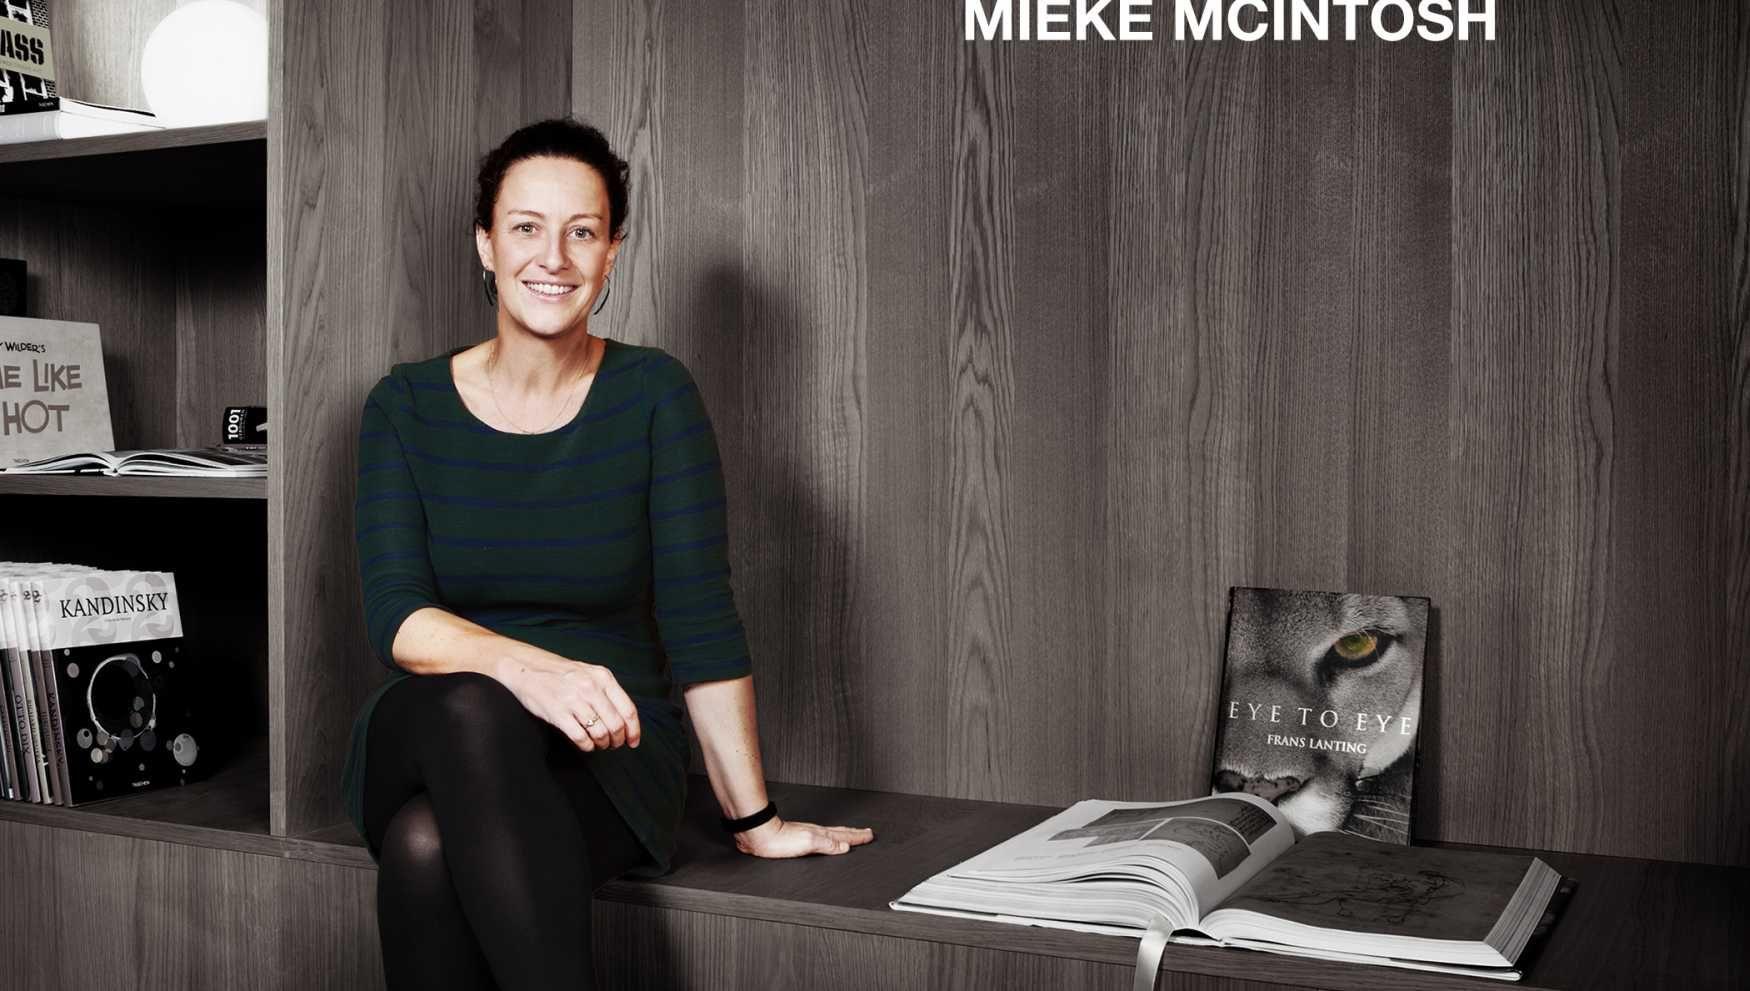 Mieke Mcintosh